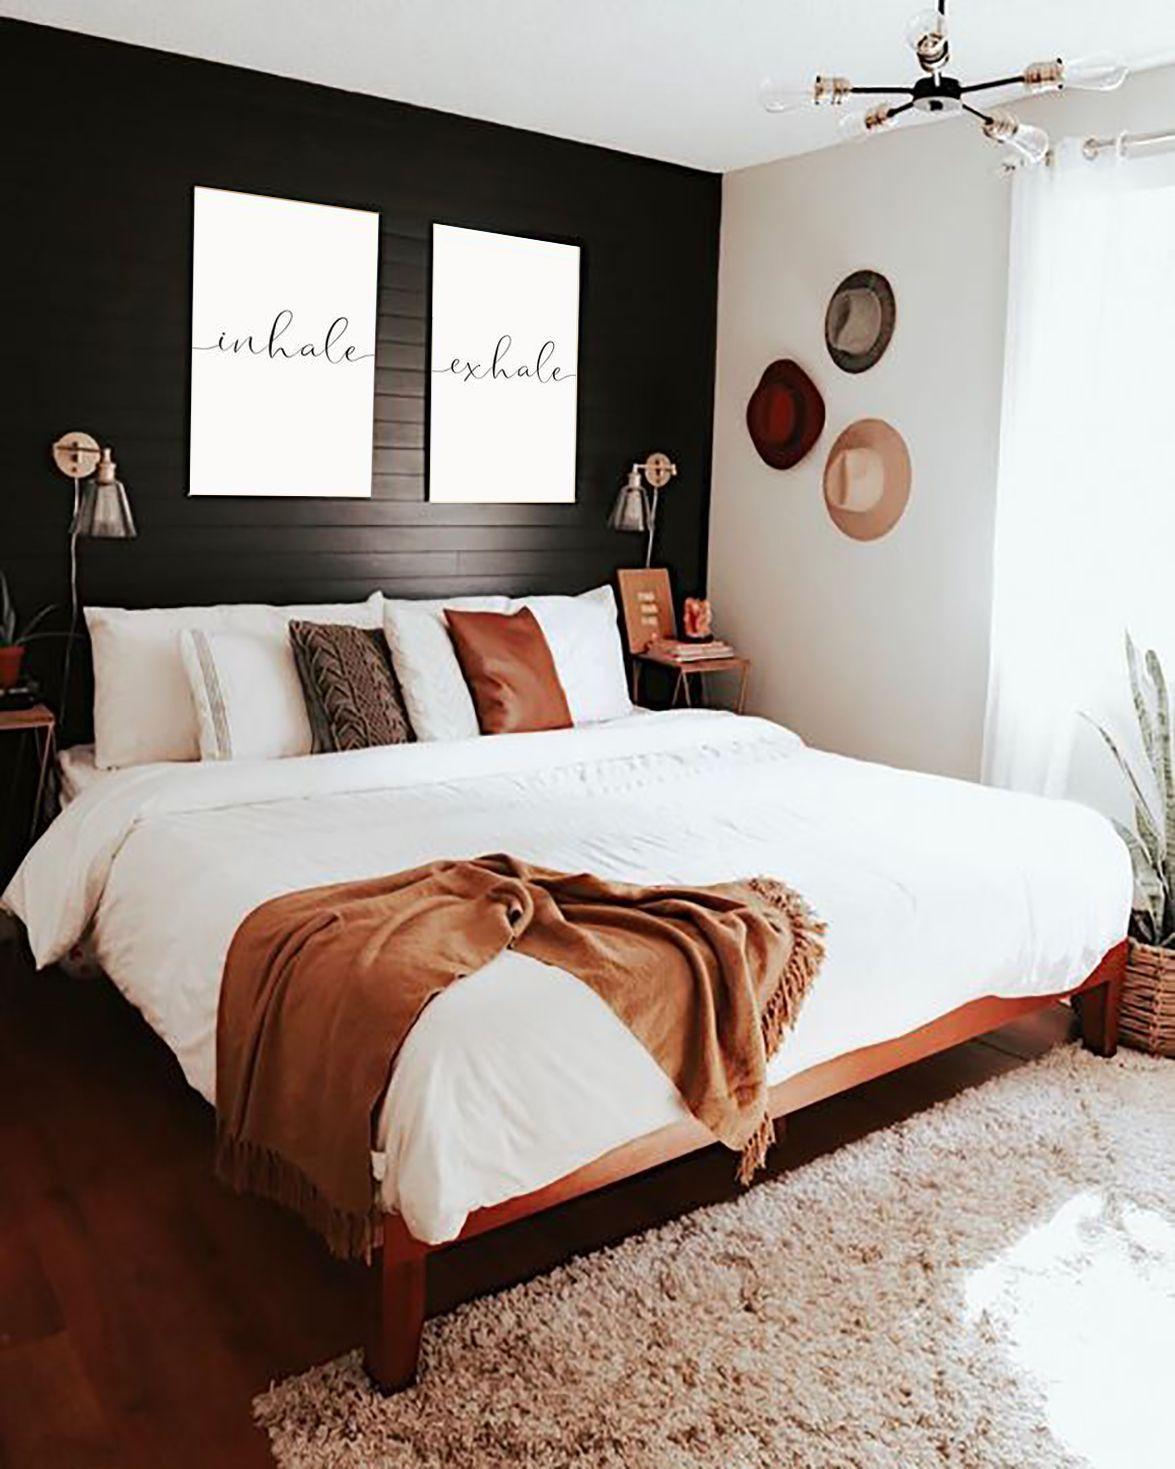 Inhale Exhale Print Home Decor Scandinavian Prints Zen Home Bedroom Decor Meditation Poster Decor Modern Hom In 2020 Minimalist Bedroom Modern Bedroom Bedroom Makeover